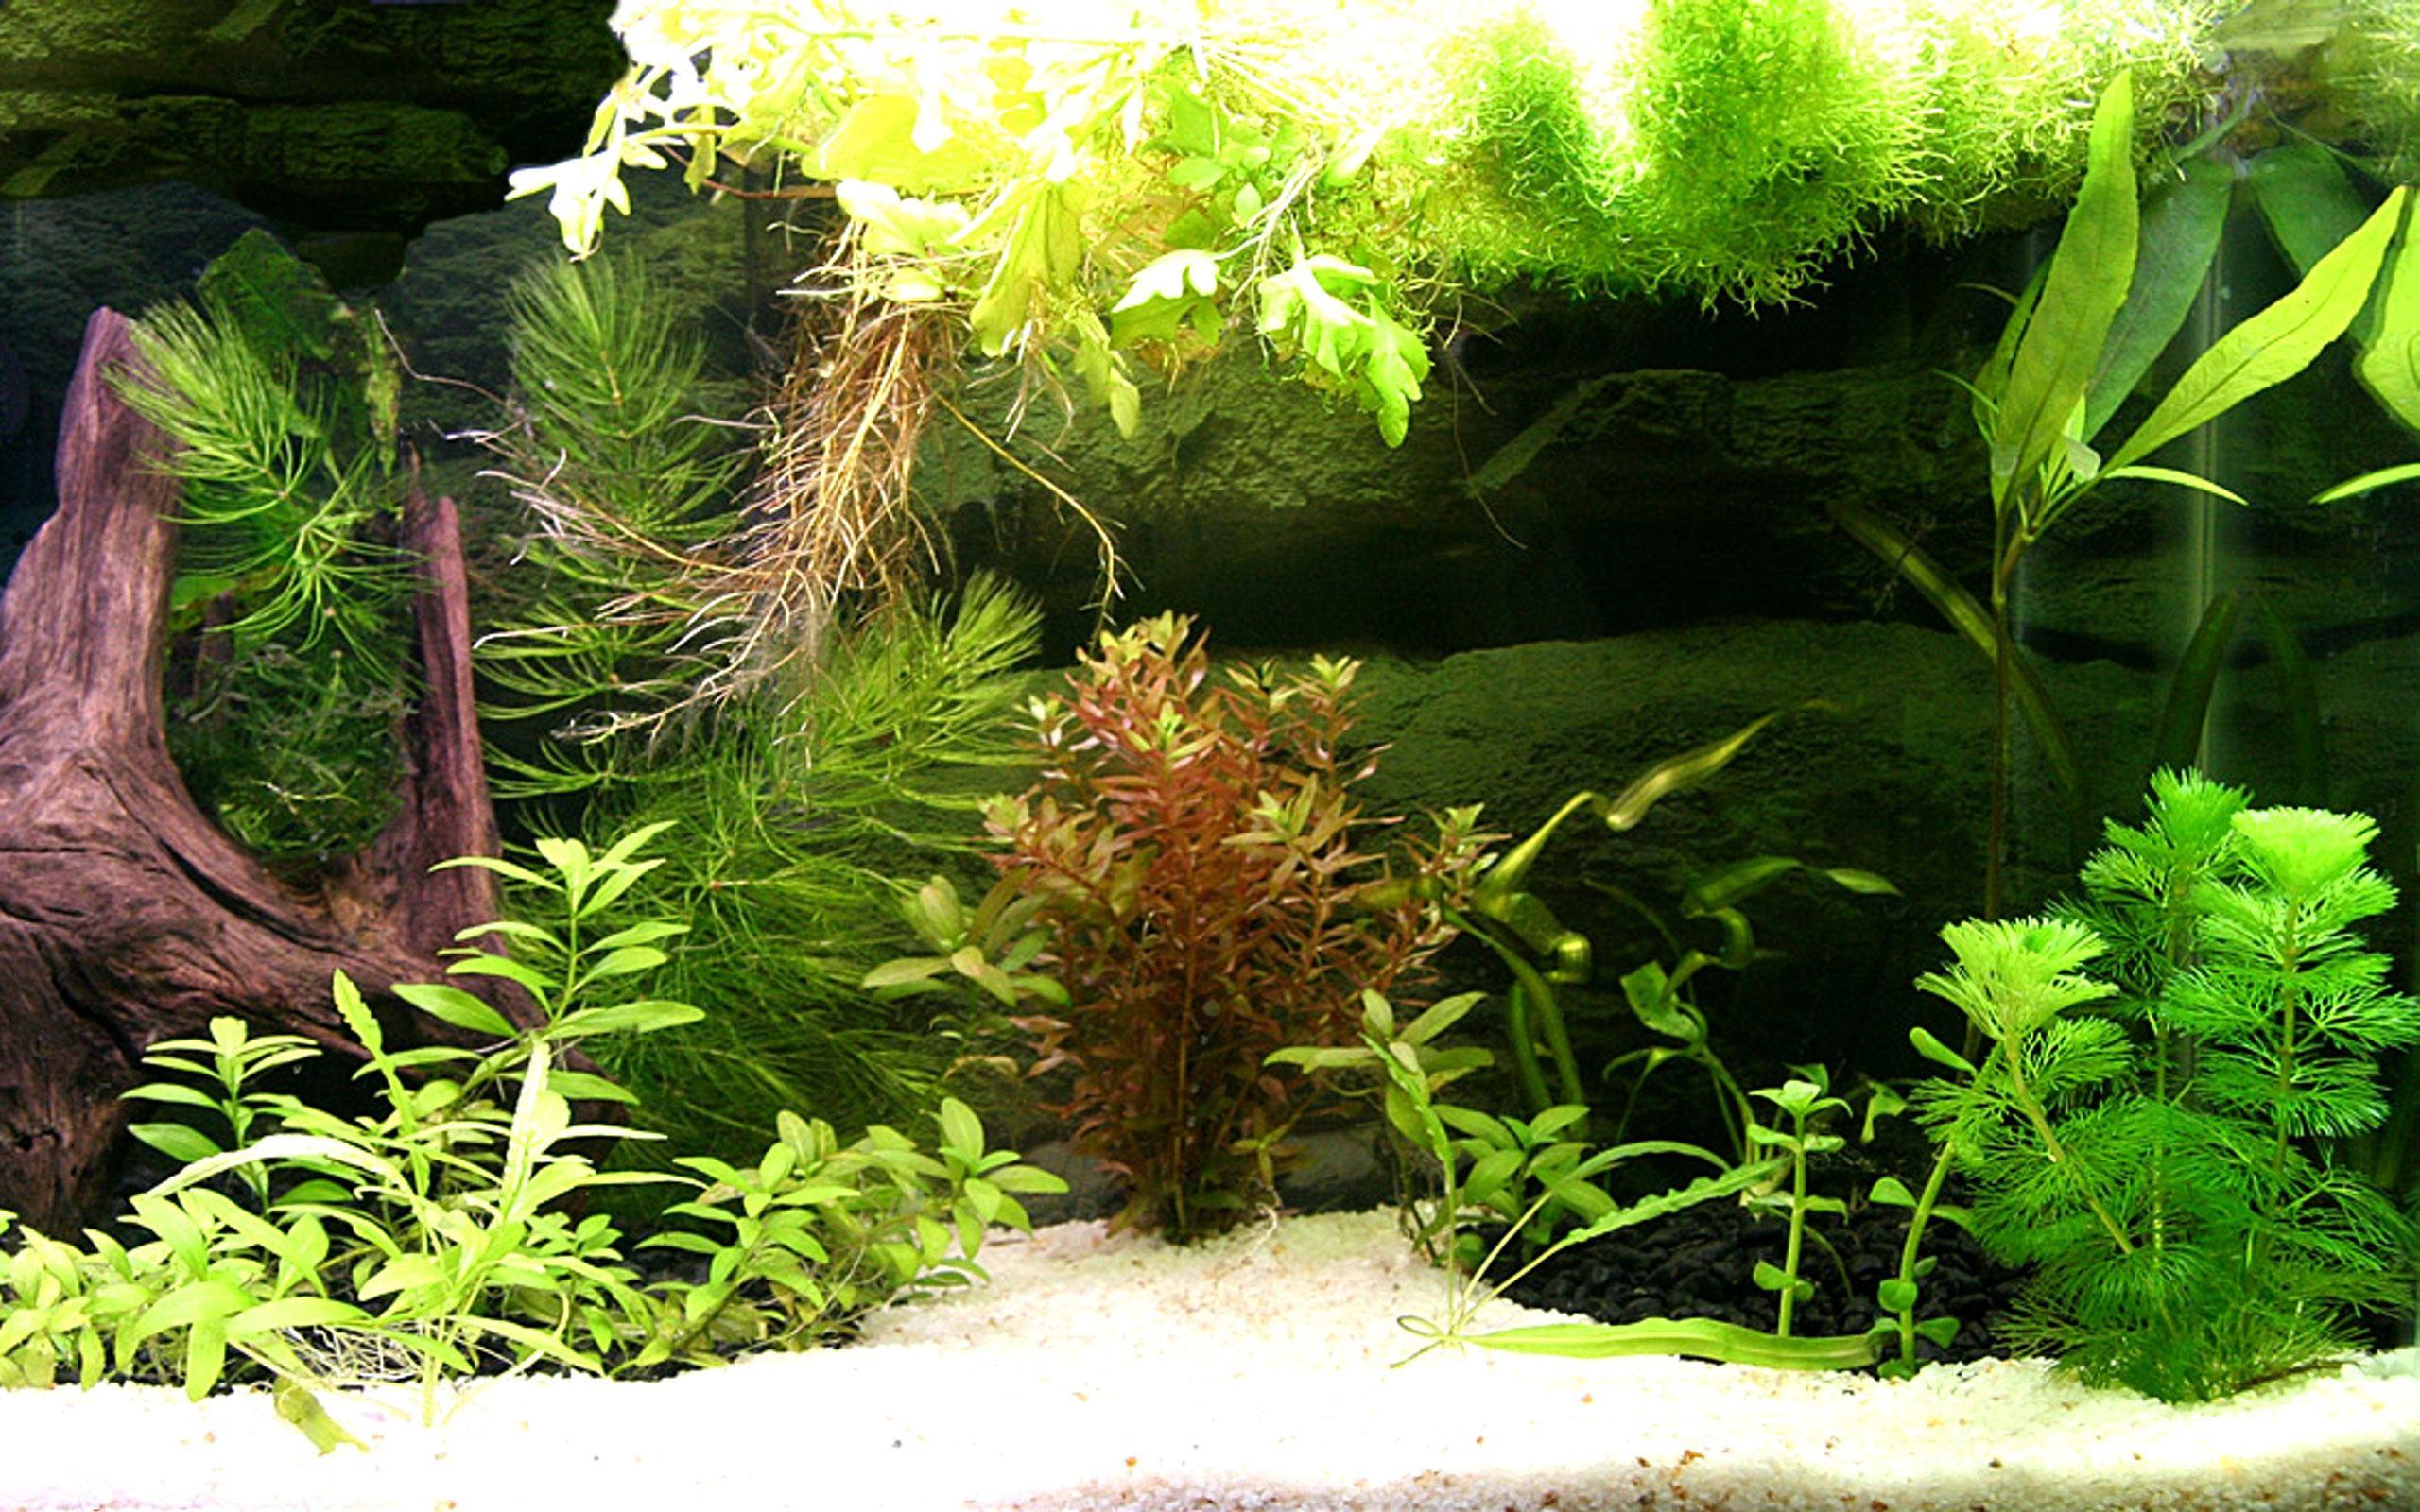 Fish Tank Desktop Background Animated : Fish tank backgrounds download  pixelstalk.net